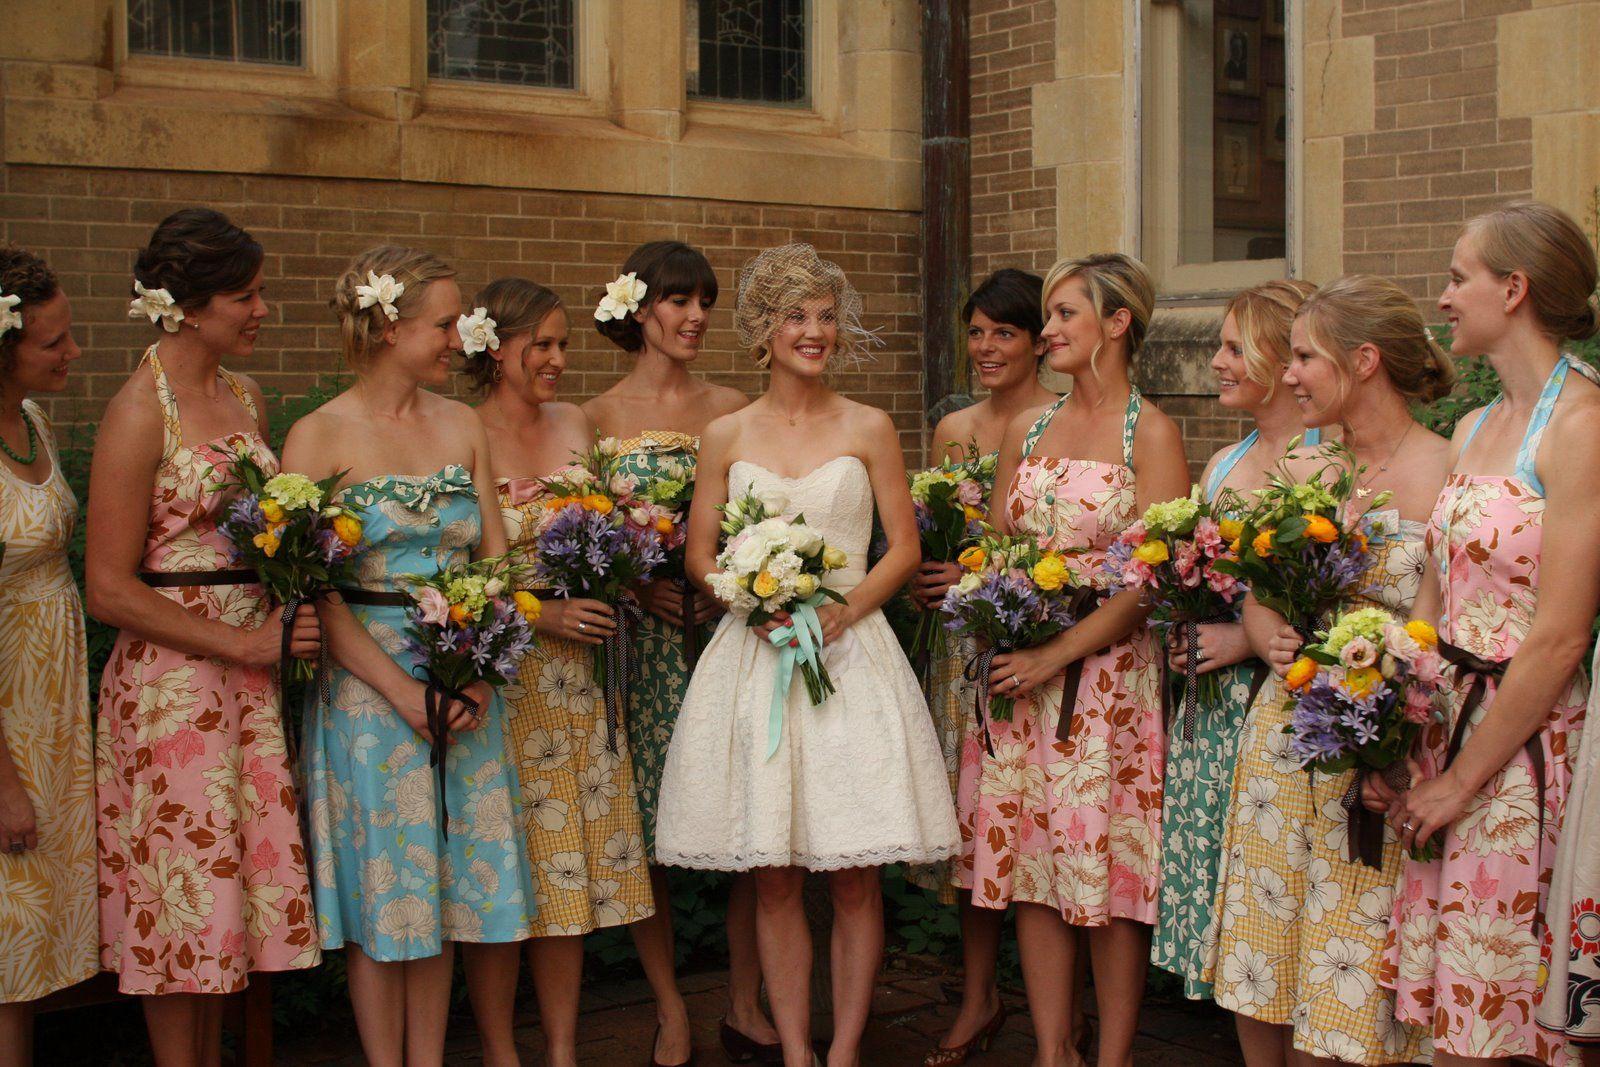 Floral bridesmaids dresses floral bridesmaid dresses wedding and floral bridesmaids dresses glitter inc ombrellifo Gallery